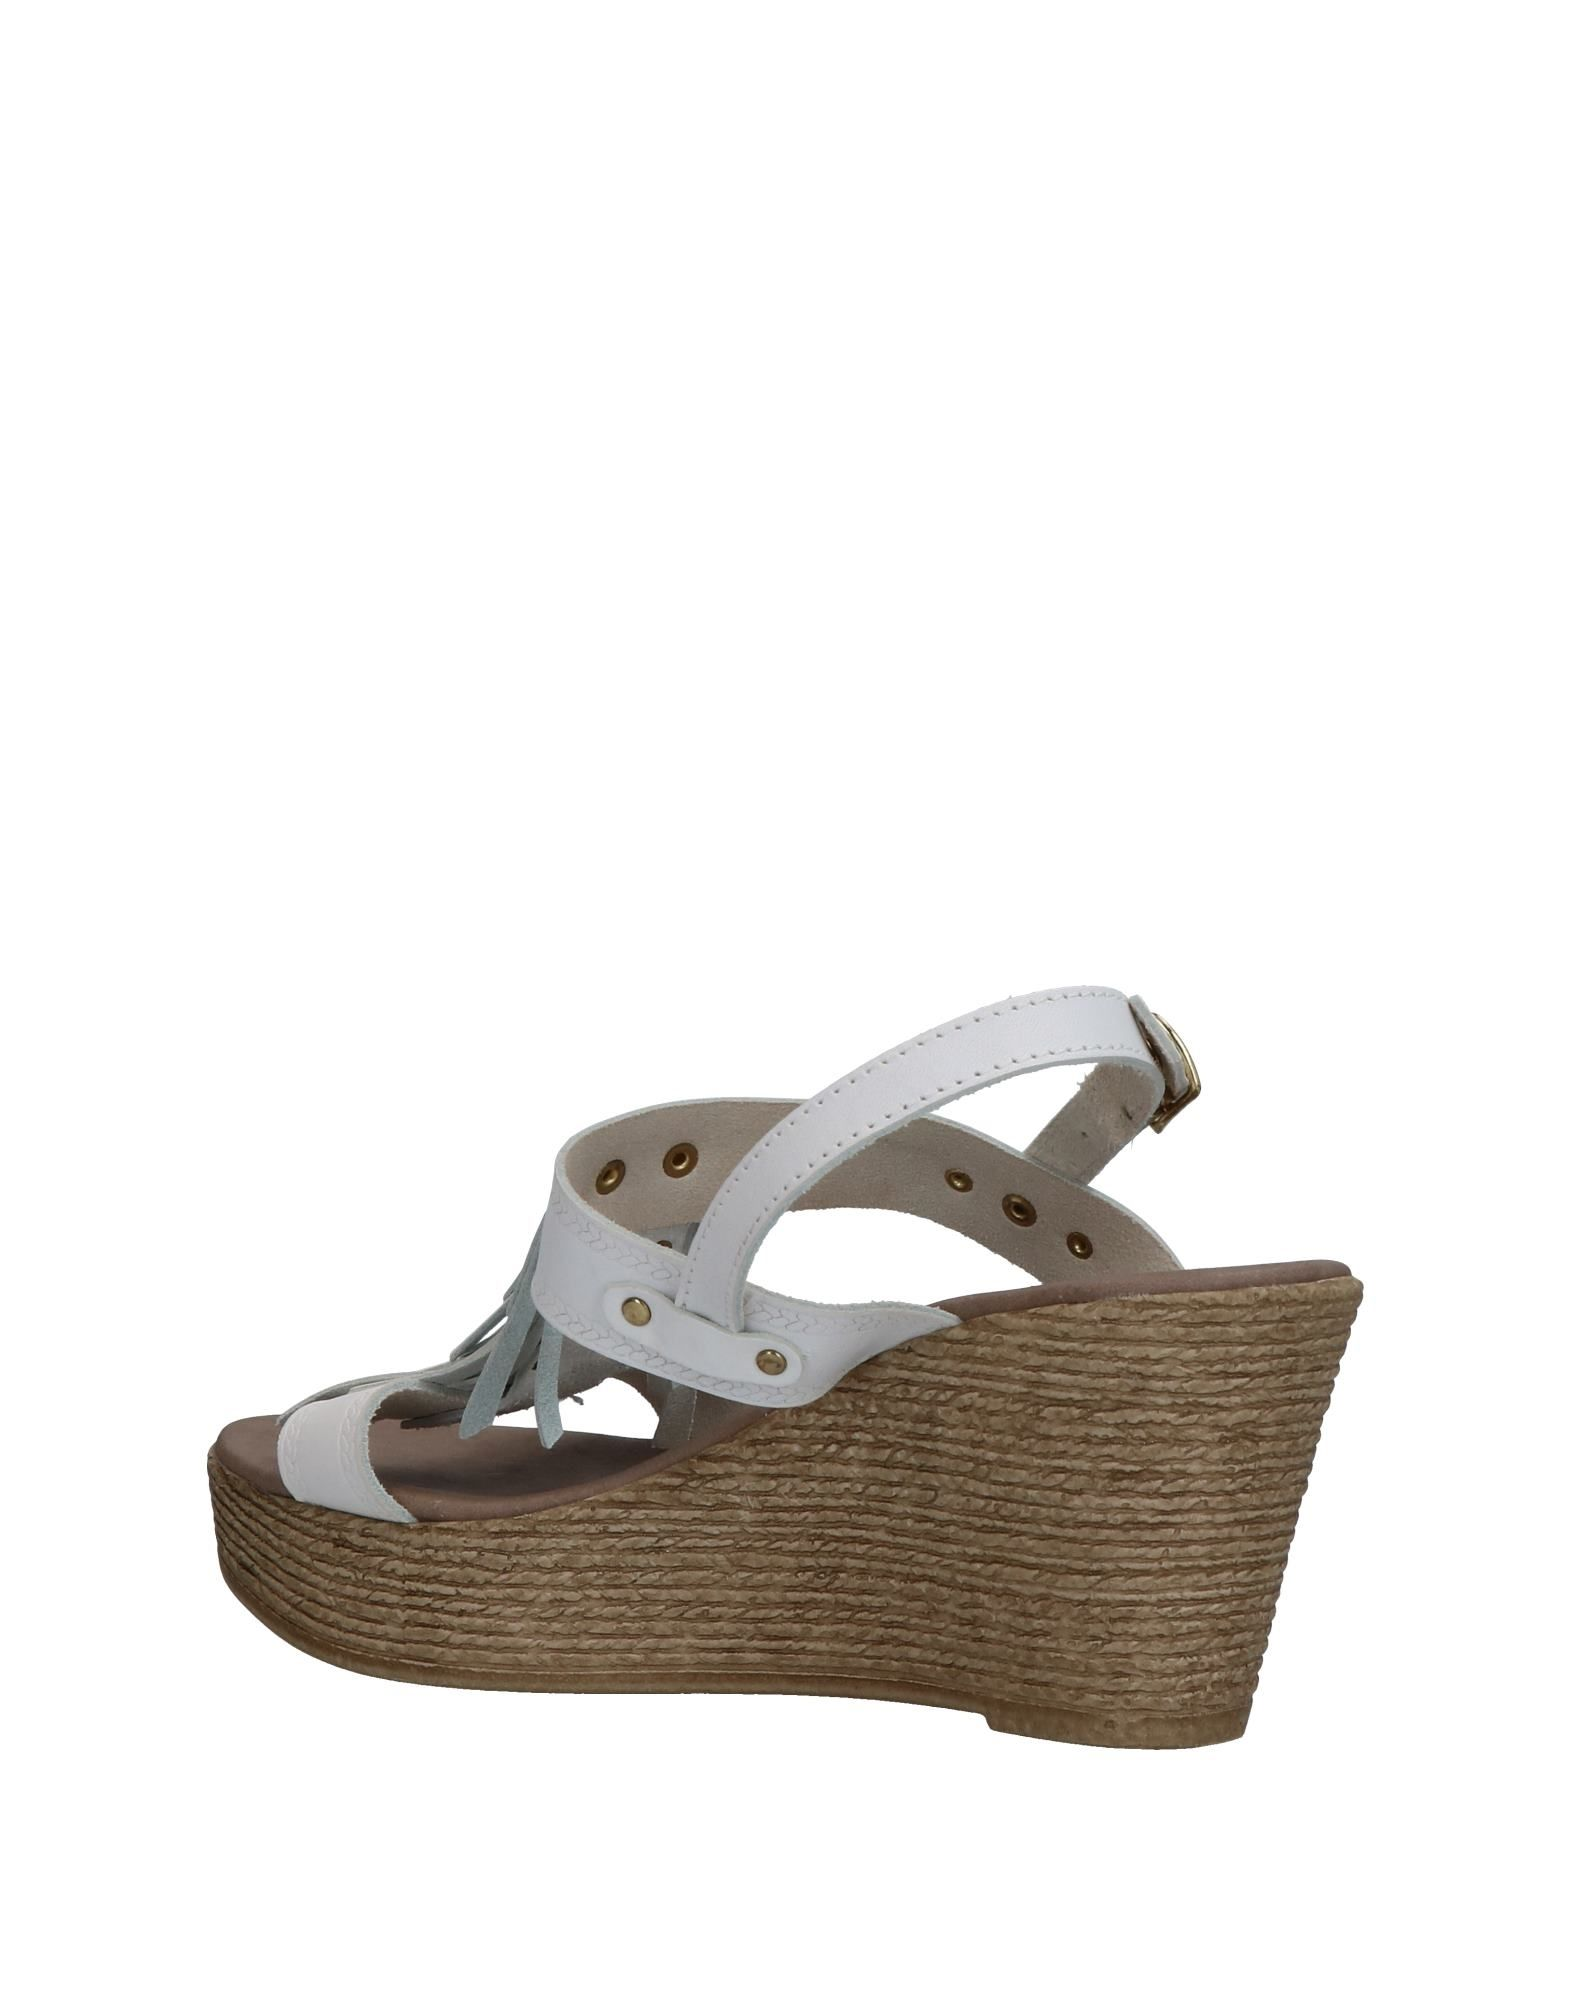 Sandales Mercante Di Fiori Femme - Sandales Mercante Di Fiori sur